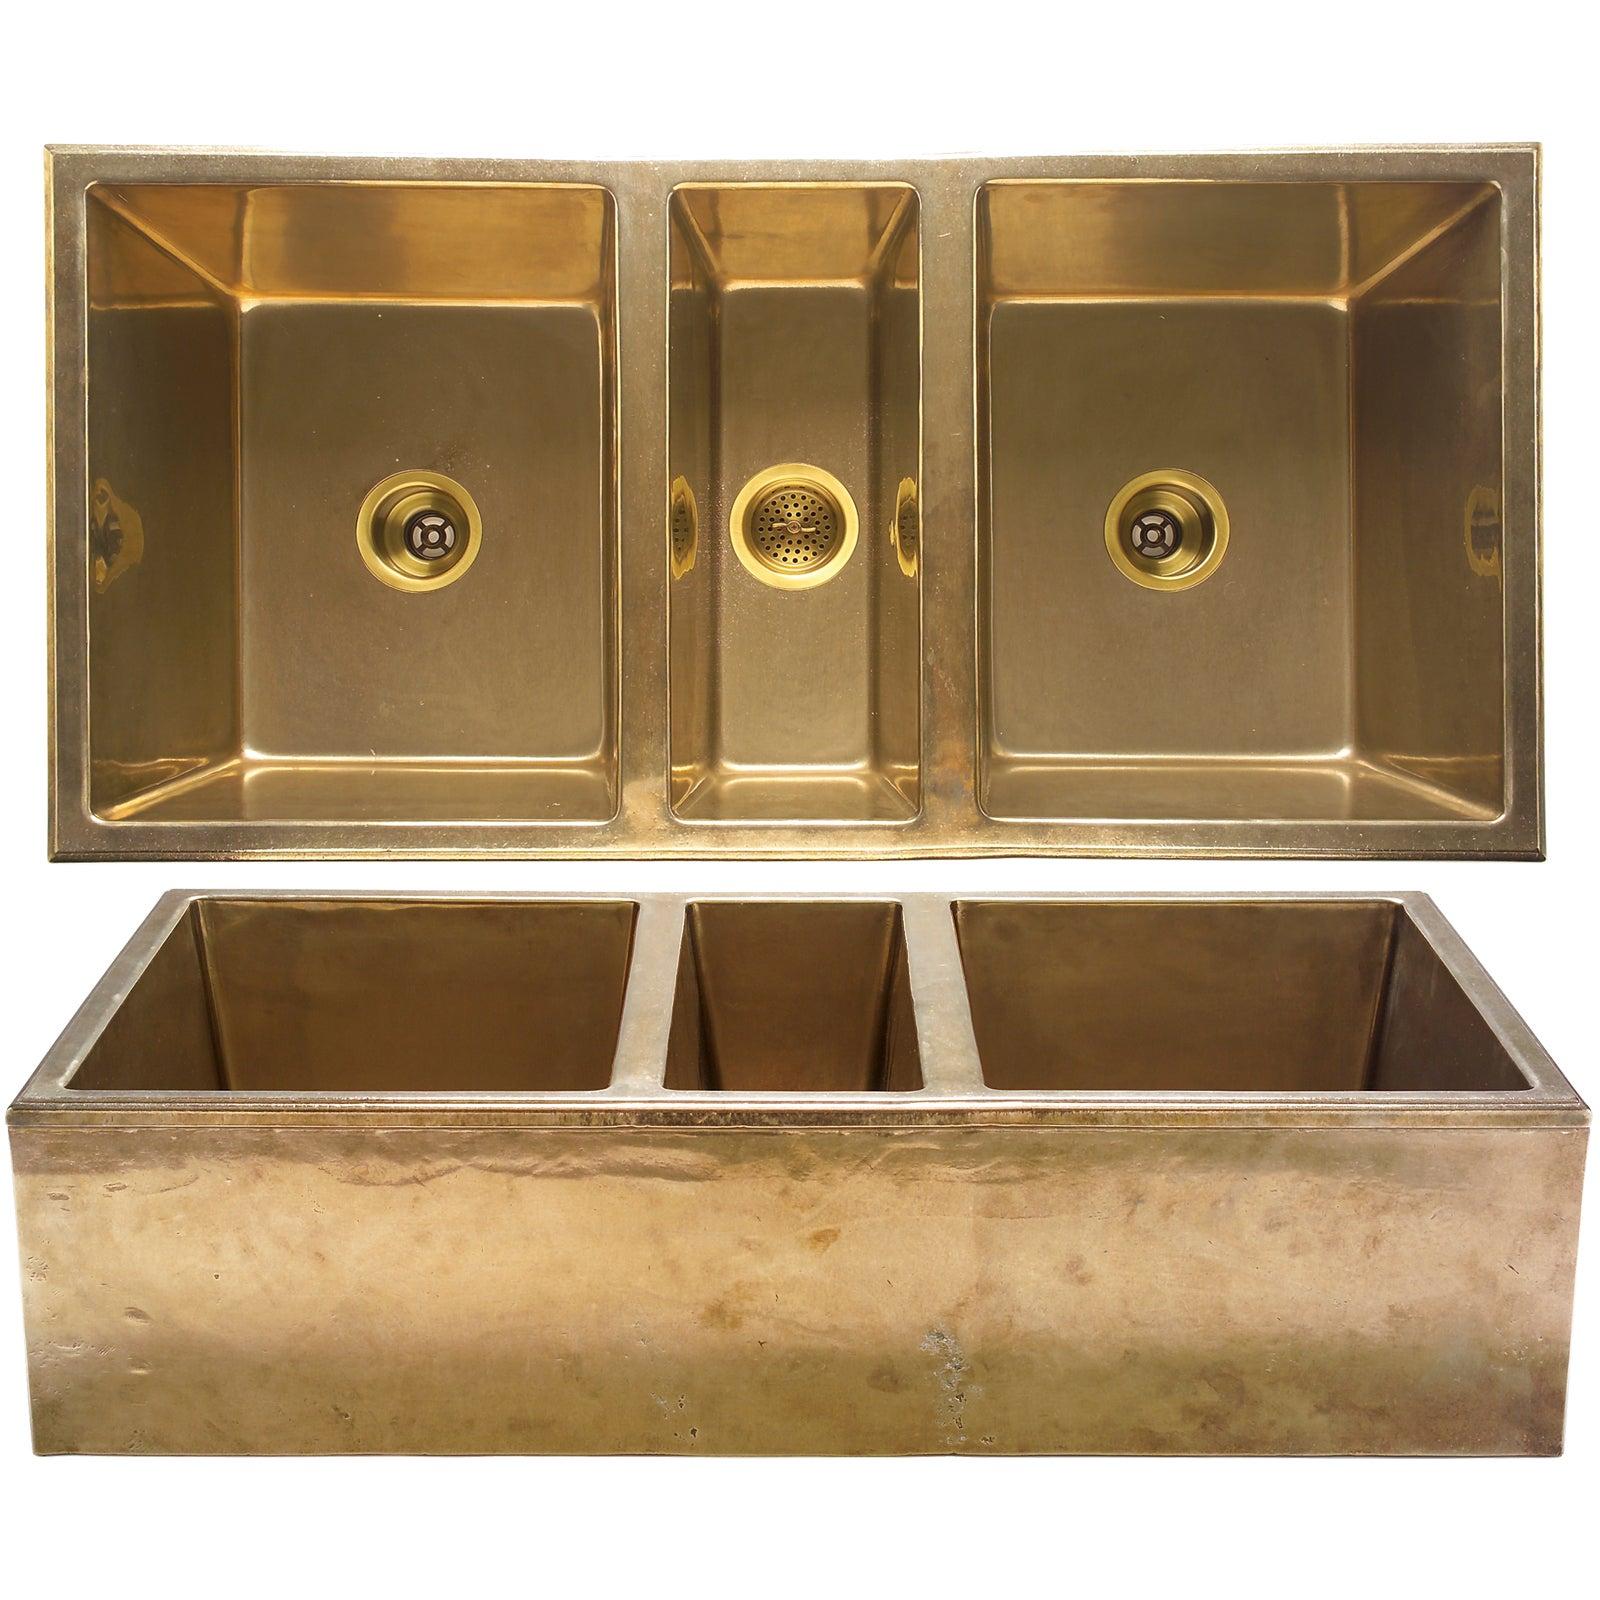 KS4422_RMH_Bronze_Sink